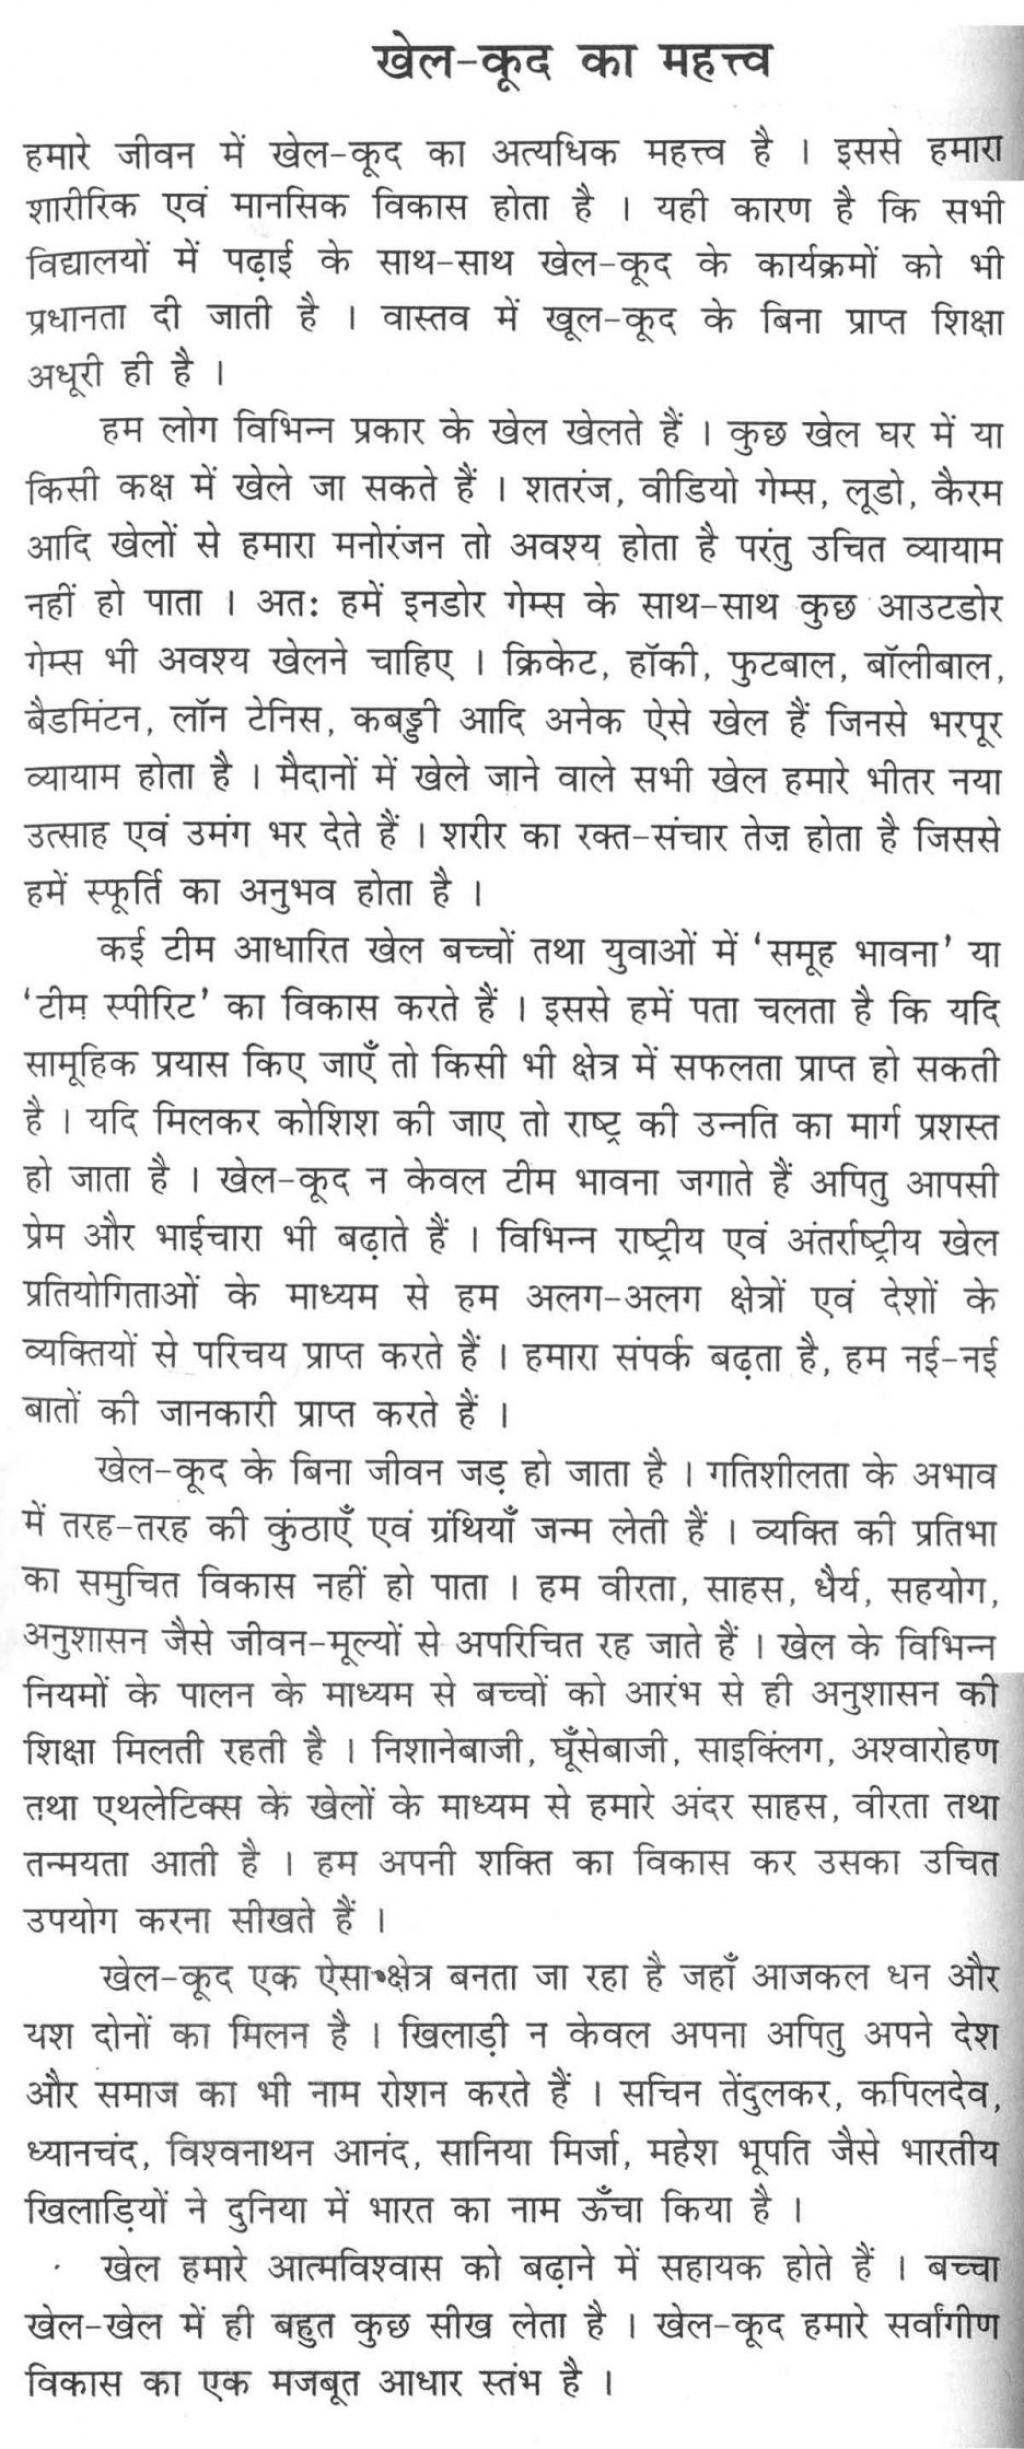 025 Importance Of Voting Essay Essays Hindi Thumb Pdf In Kannada The Tamil Persuasive English India On Punjabi Rights 936x2239 Unforgettable Marathi Large